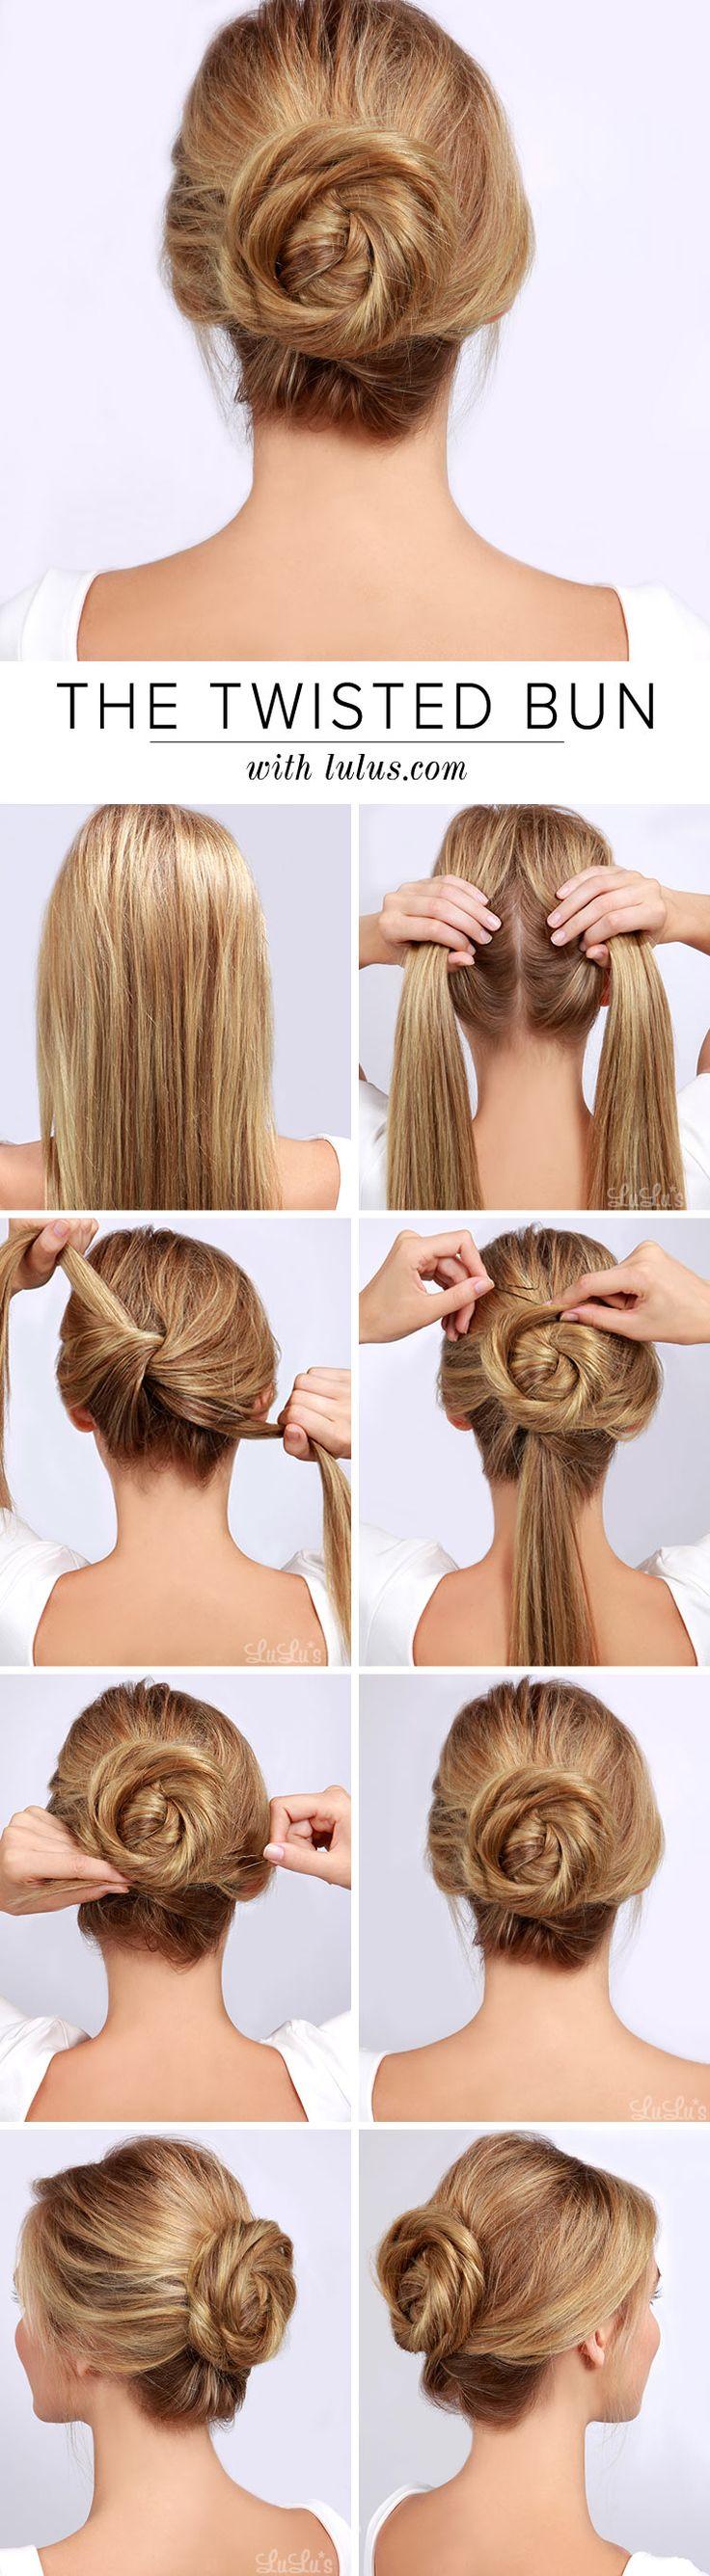 Astounding 1000 Ideas About Chignon Updo On Pinterest Easy Chignon Messy Short Hairstyles Gunalazisus